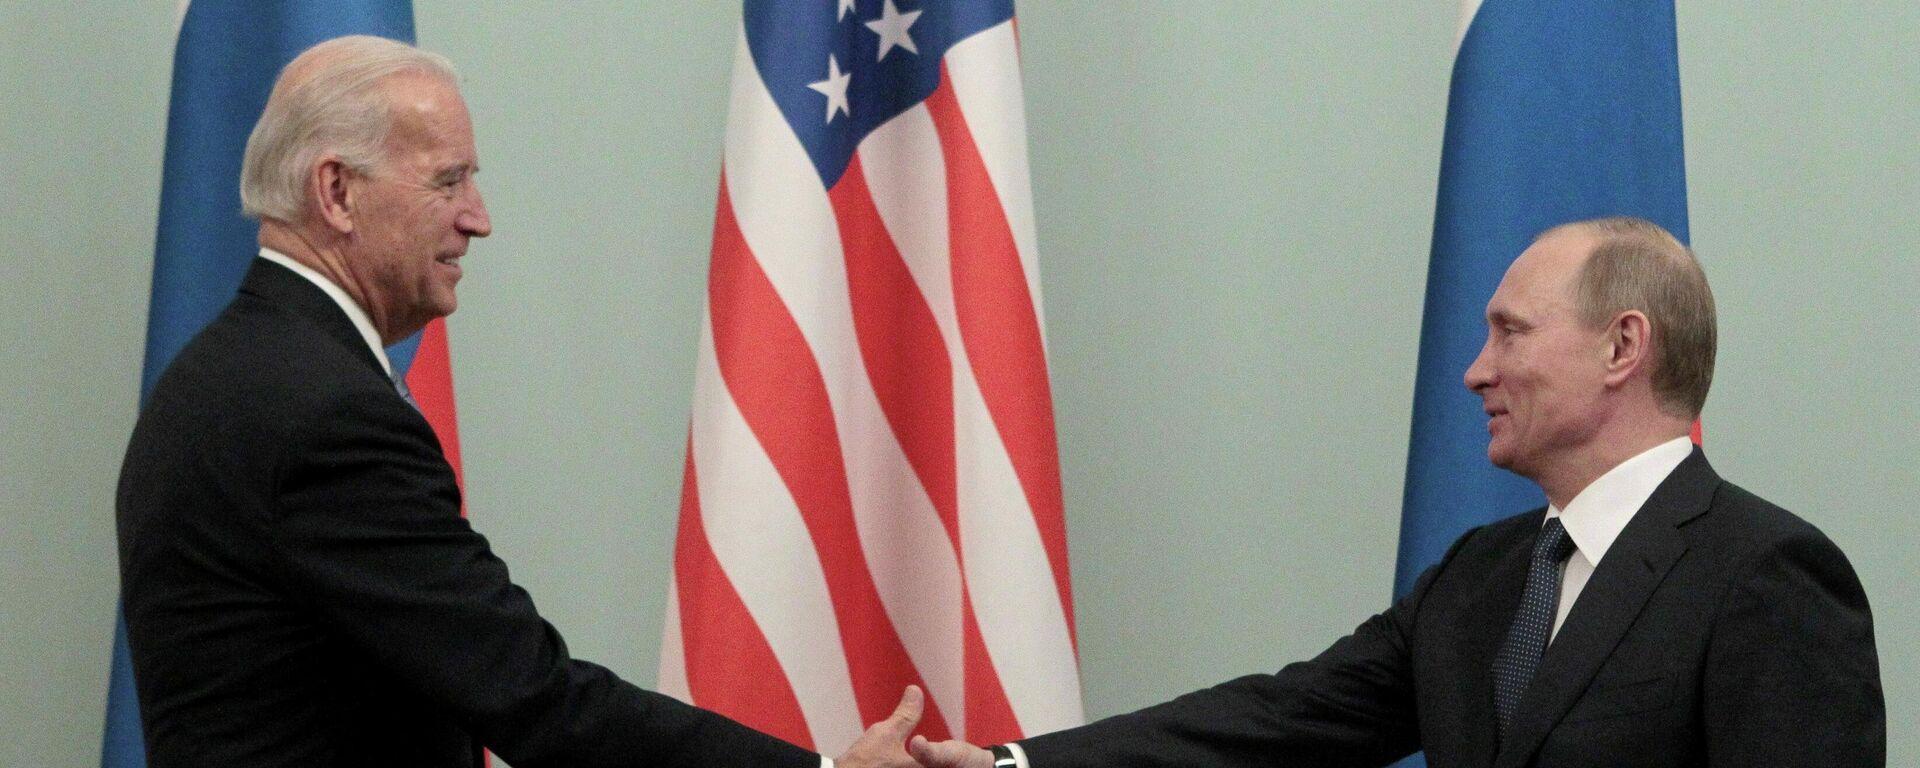 El presidente de Rusia, Vladímir Putin, con su homólogo estadounidense, Joe Biden (archivo) - Sputnik Mundo, 1920, 08.06.2021